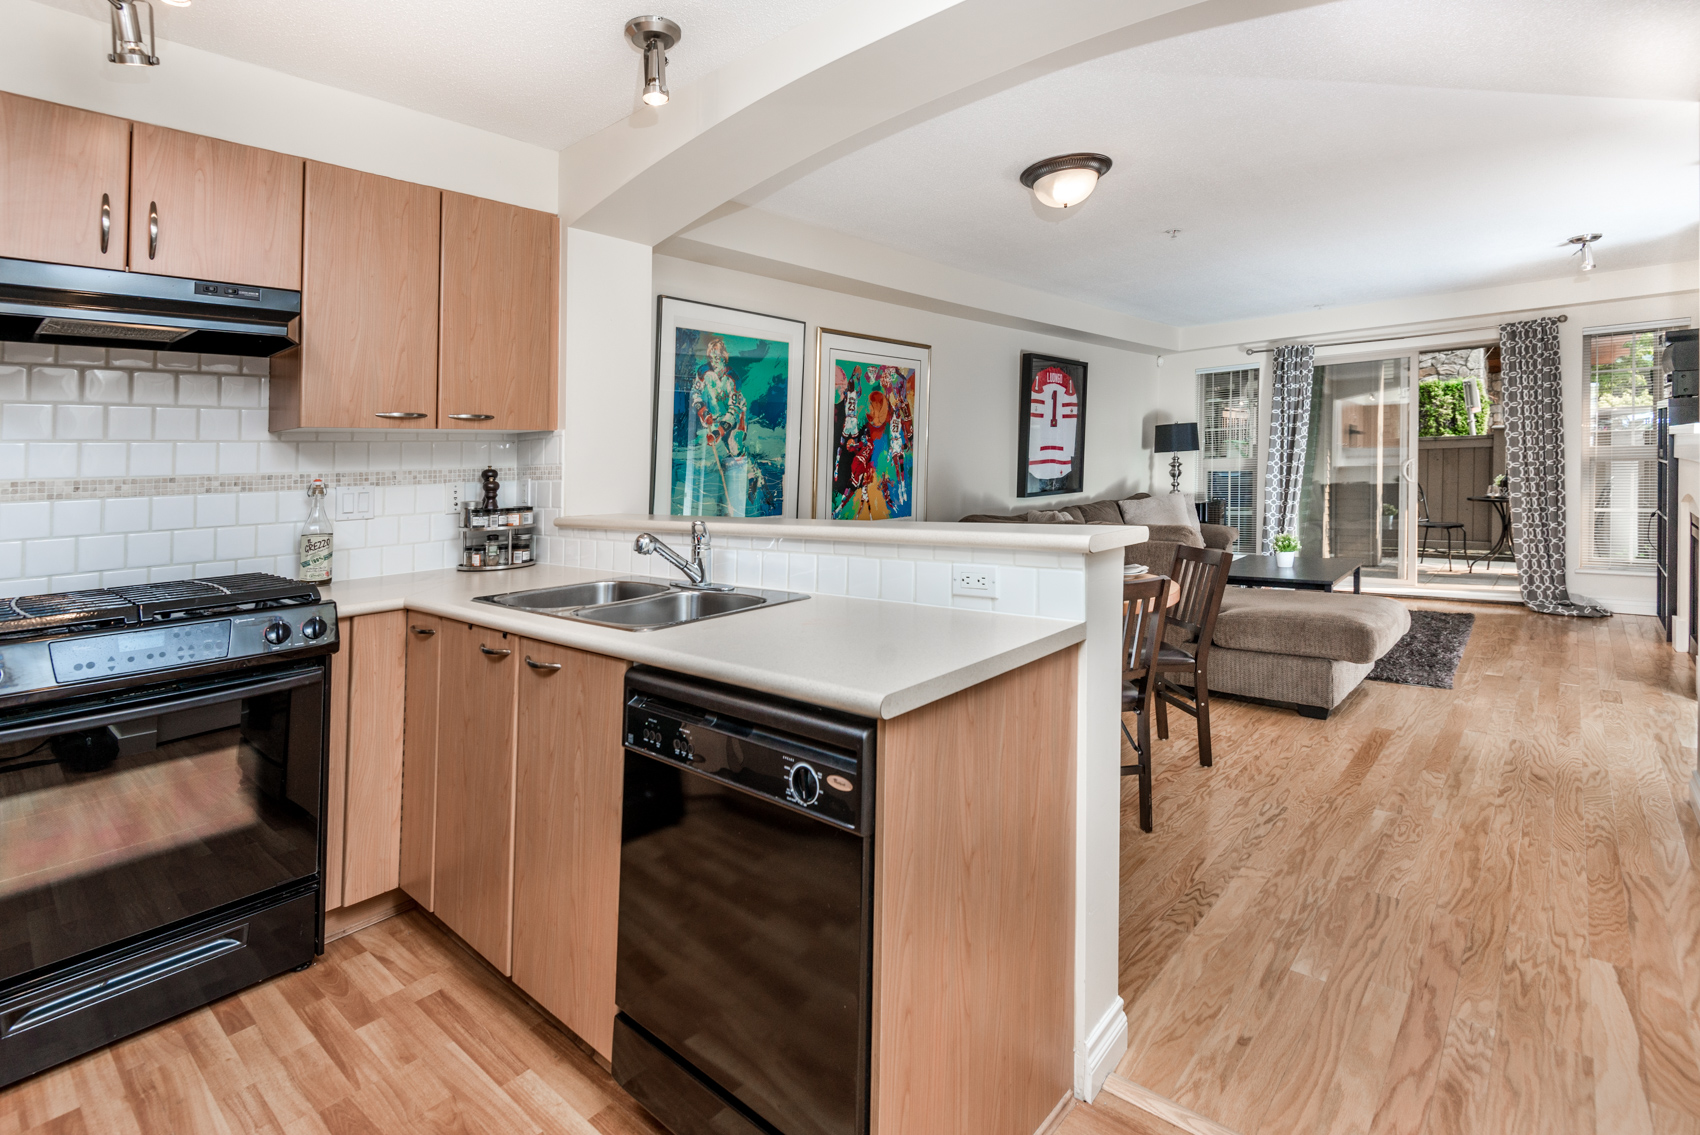 Ground Floor Unit Apartment Condo In Westwood Plateau